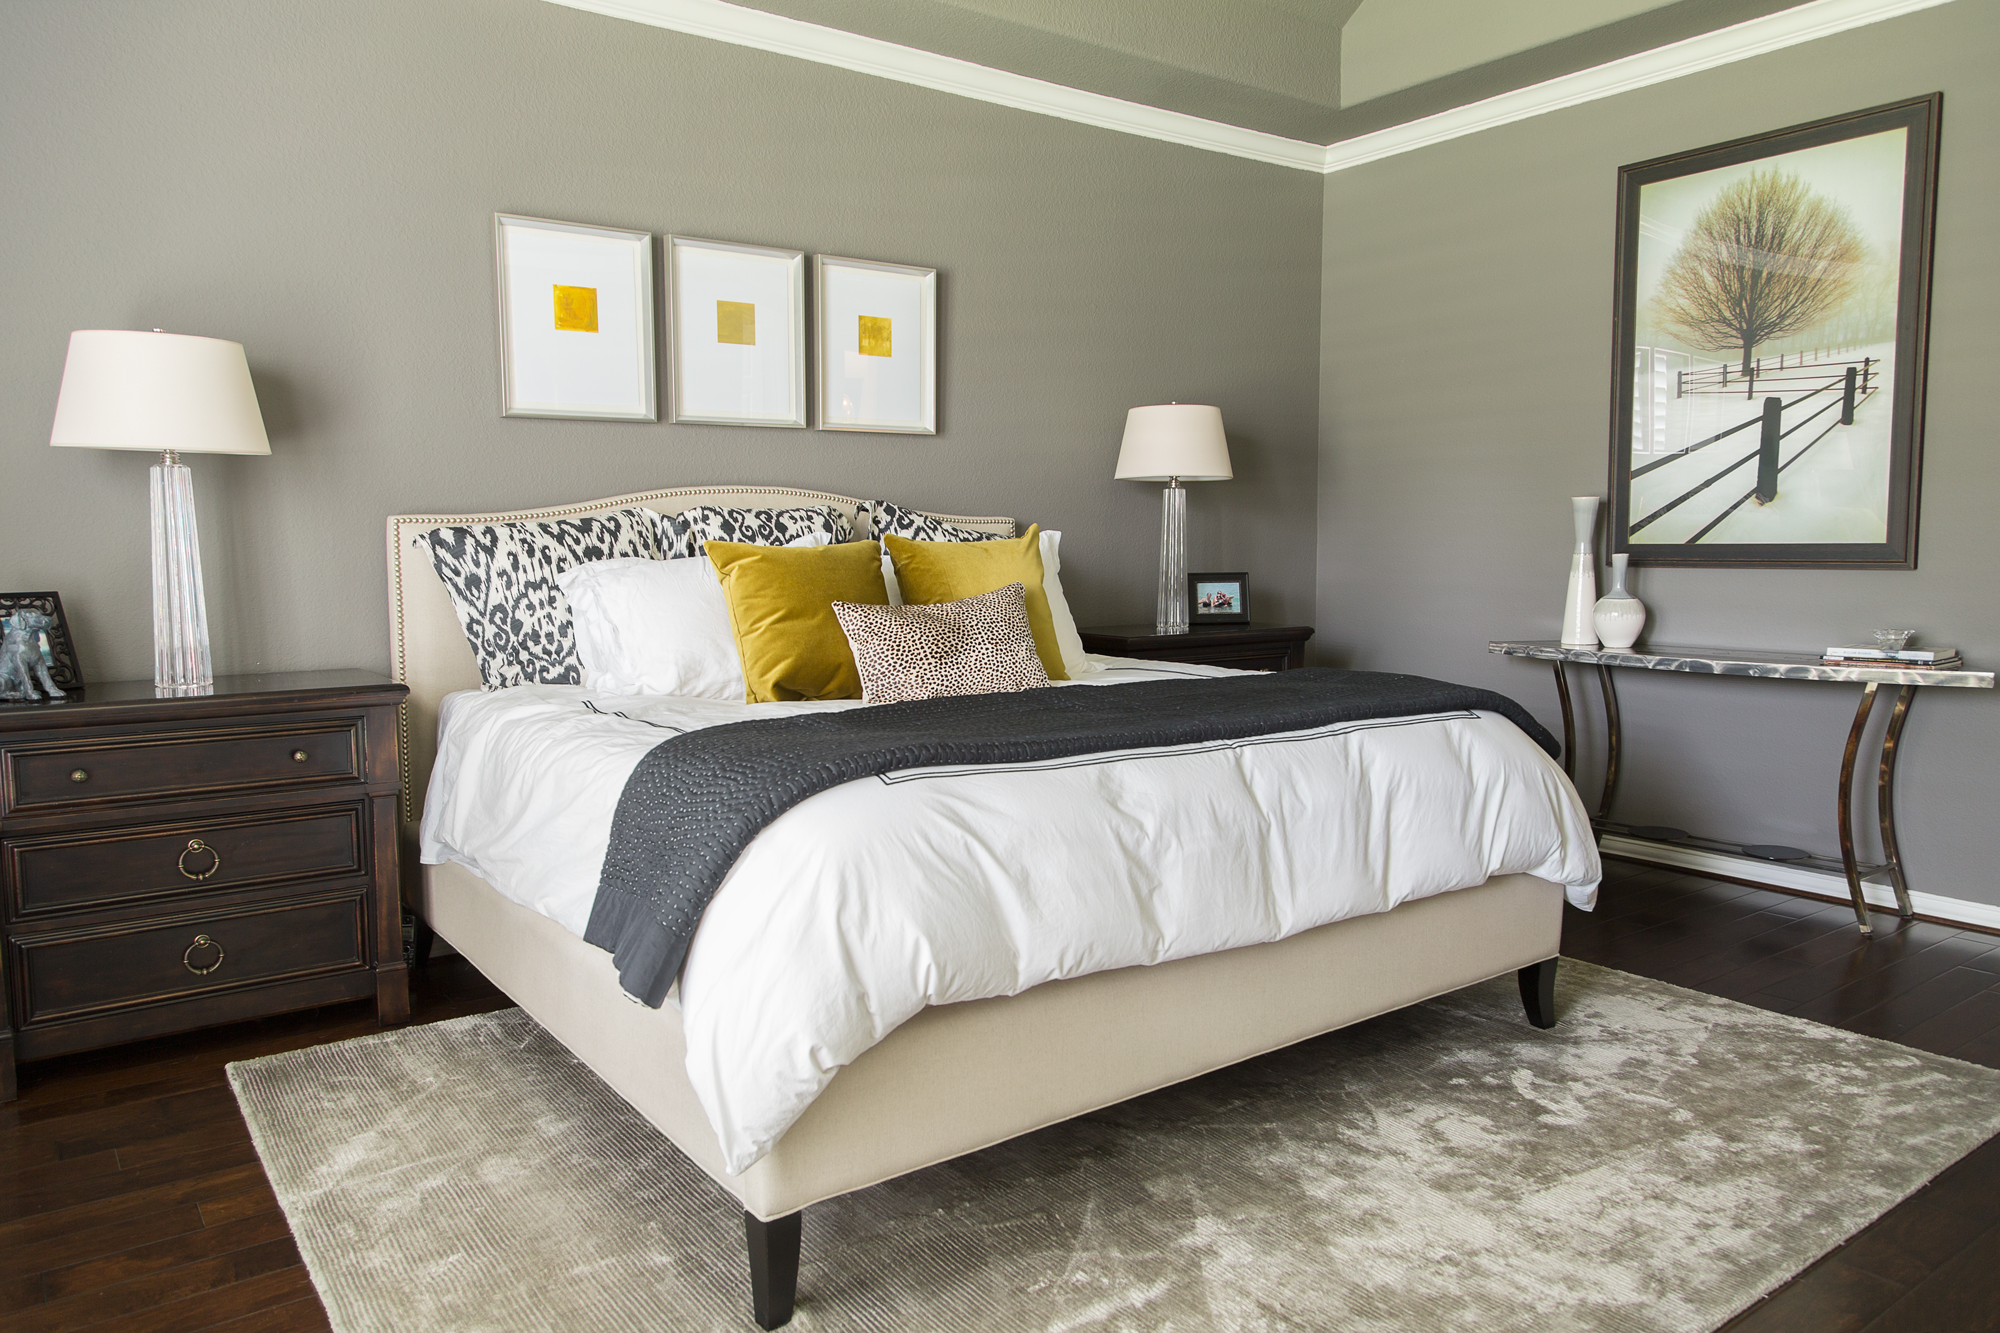 Bedroom remodel; bed; bedding; rug; lamp; lighting; mirror; table | Interior Designer: Carla Aston / Photographer: Tori Aston